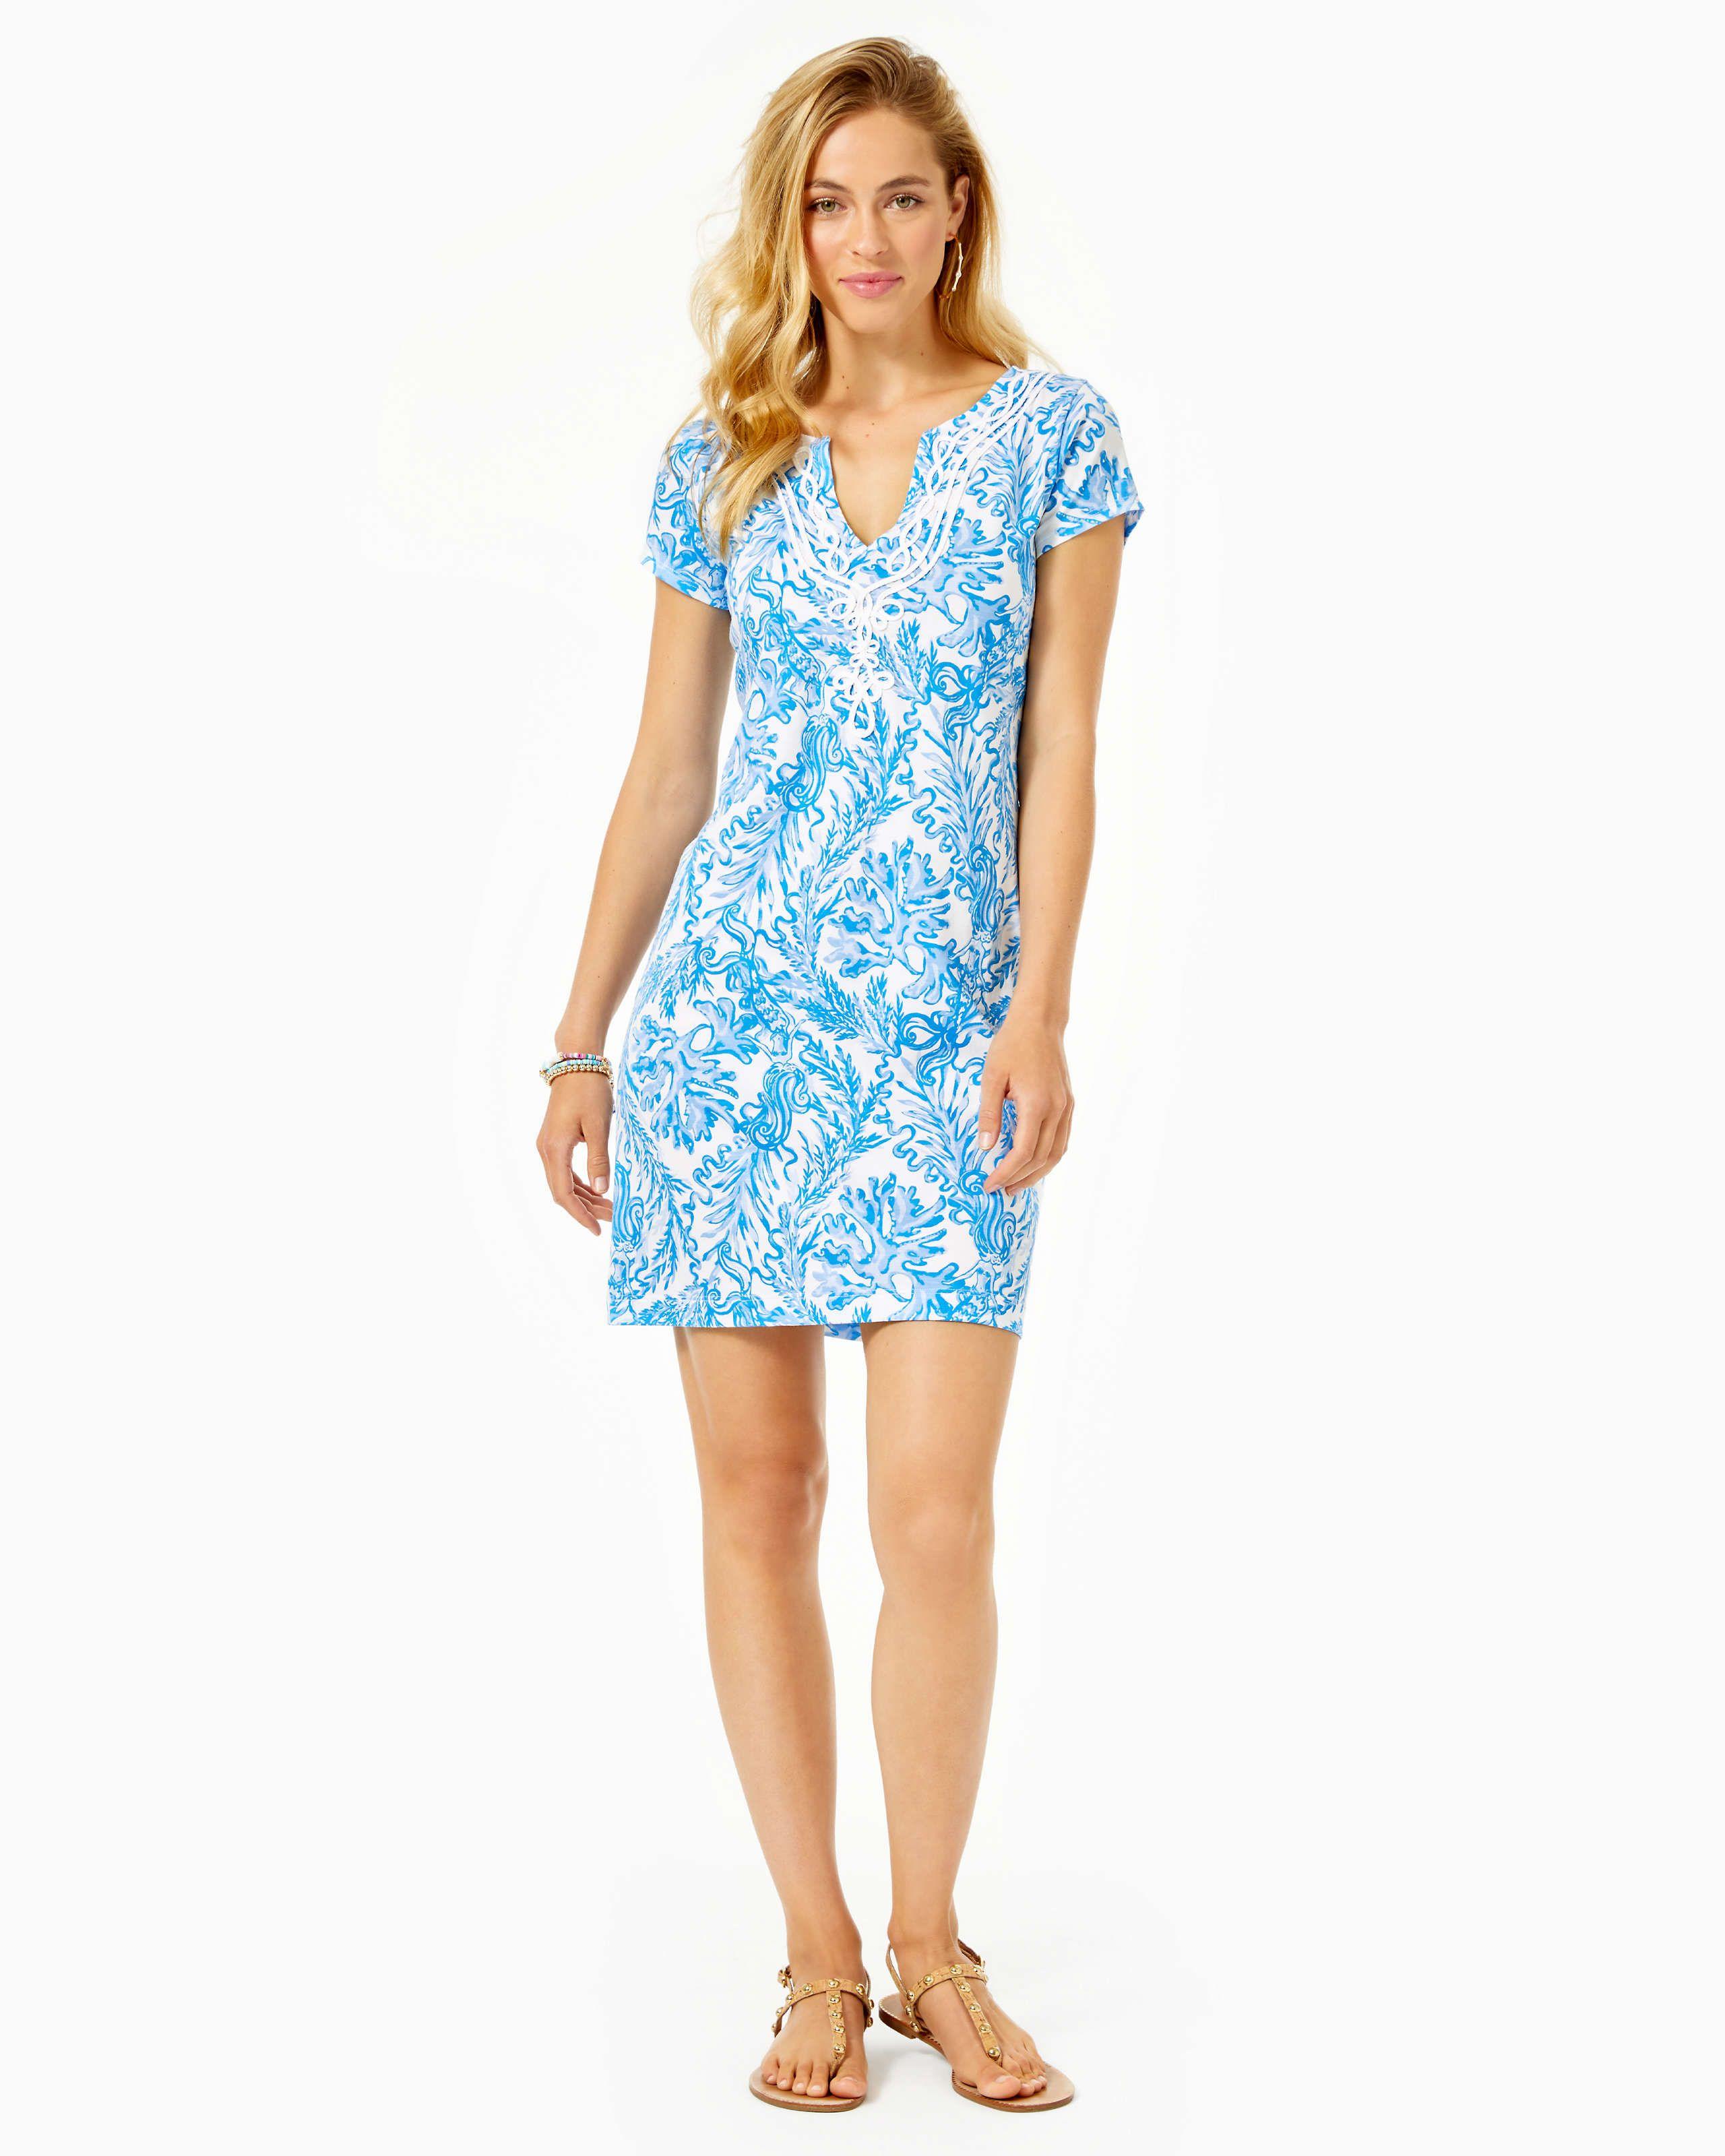 Brewster T Shirt Dress Lilly Pulitzer Dresses Womens Dresses T Shirt Dress [ 3200 x 2560 Pixel ]